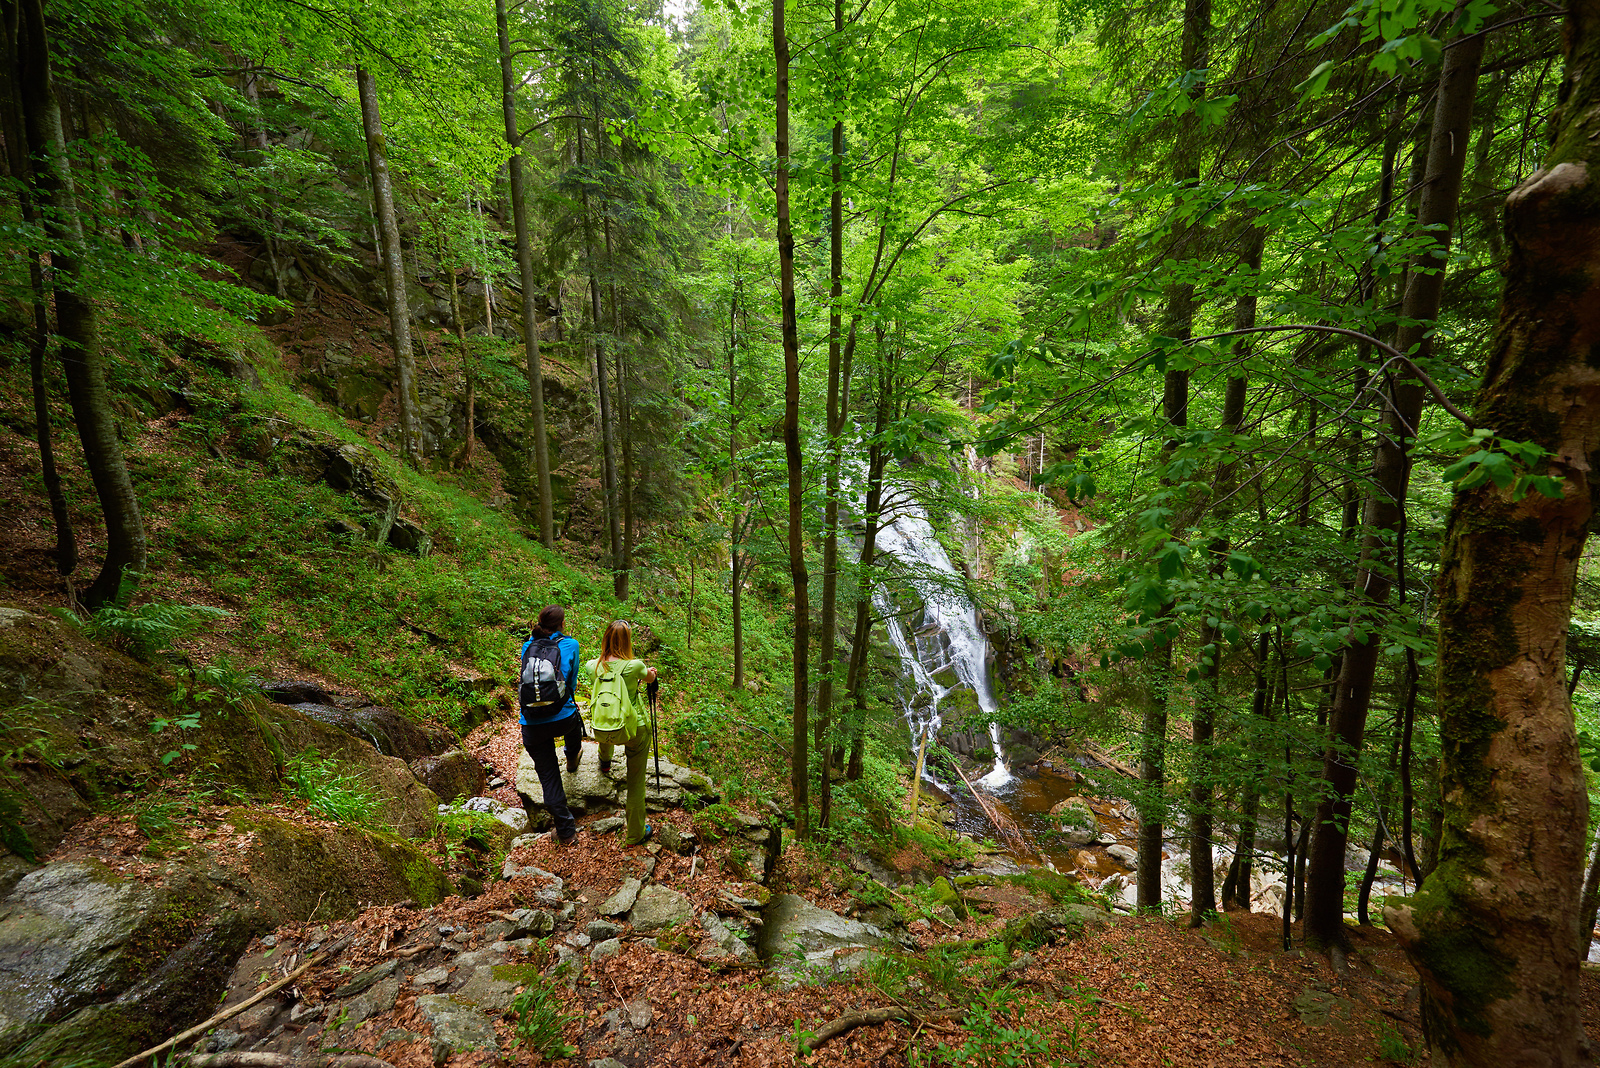 Waterfalls in Slovenia - waterfalls Šumik